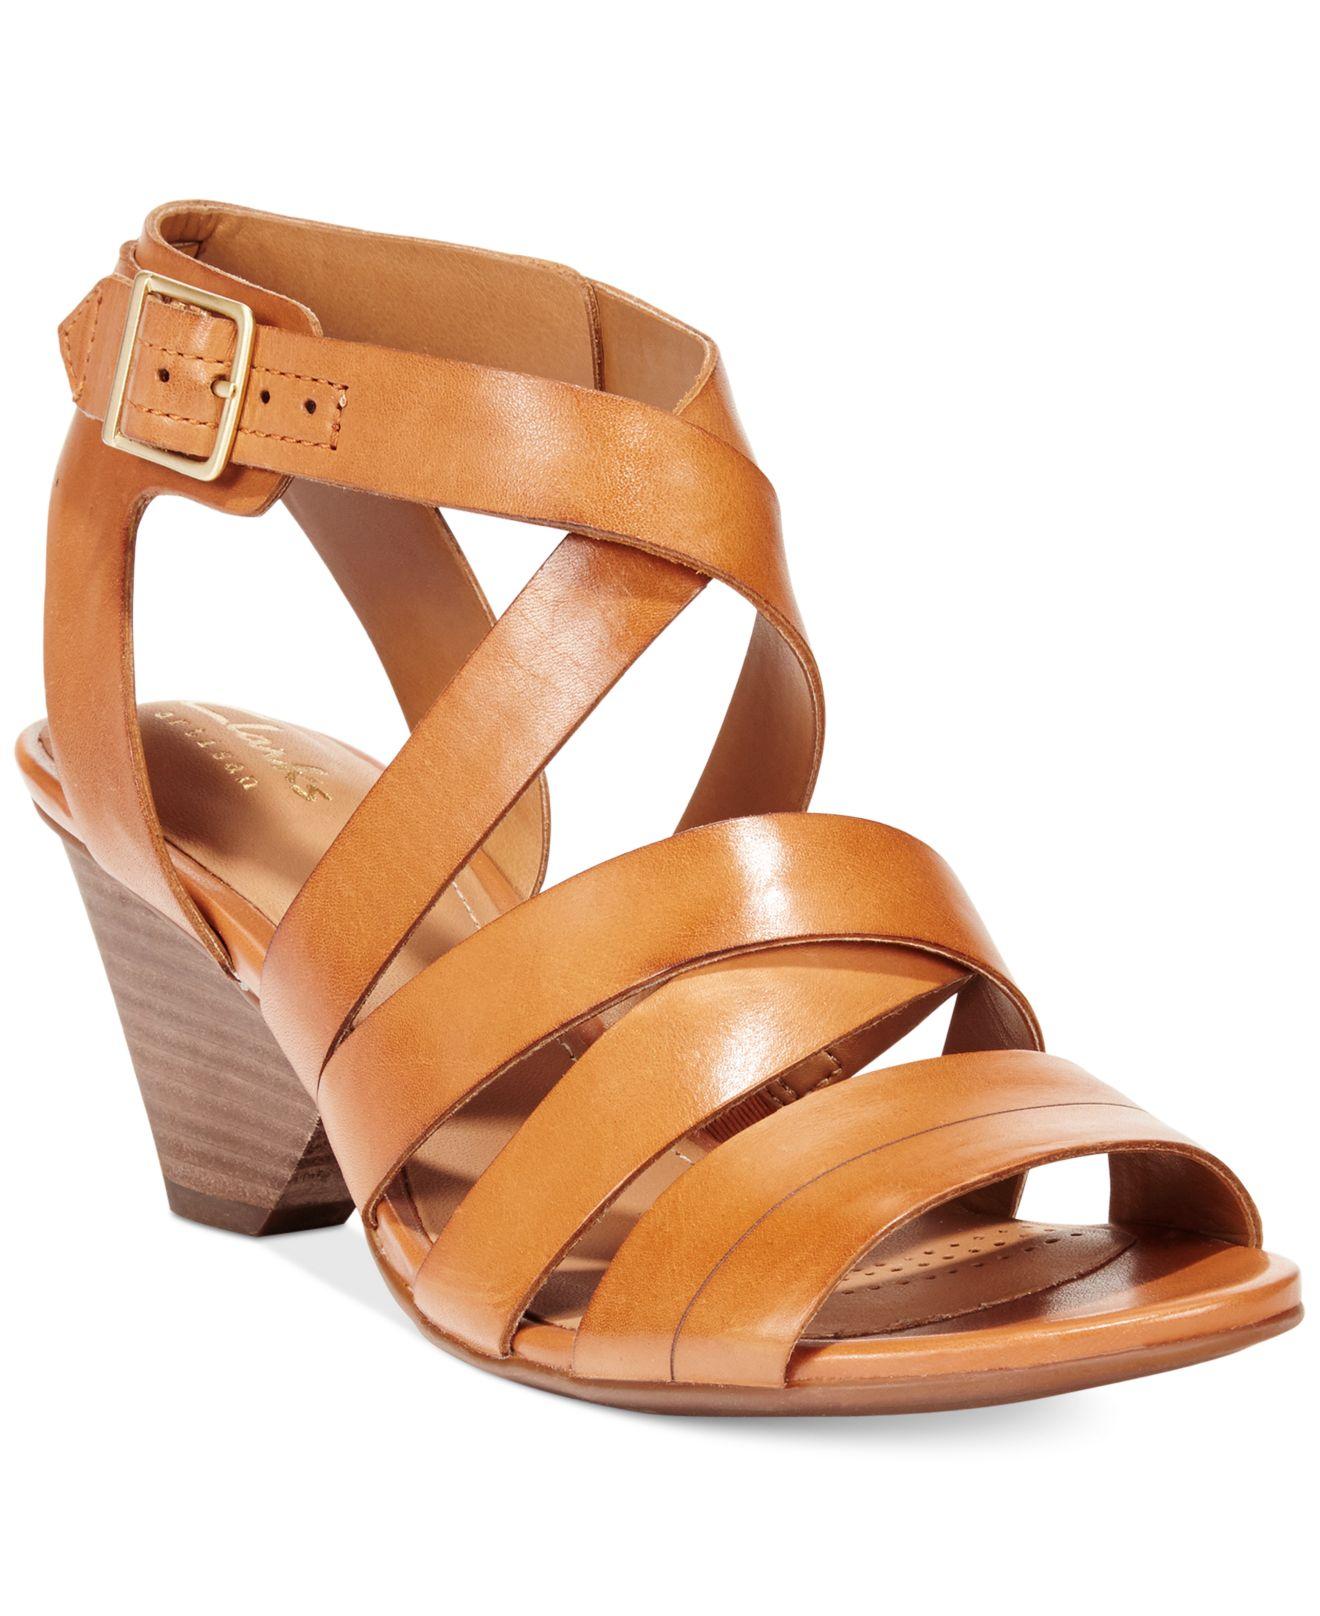 Clarks Artisan Shoes Uk